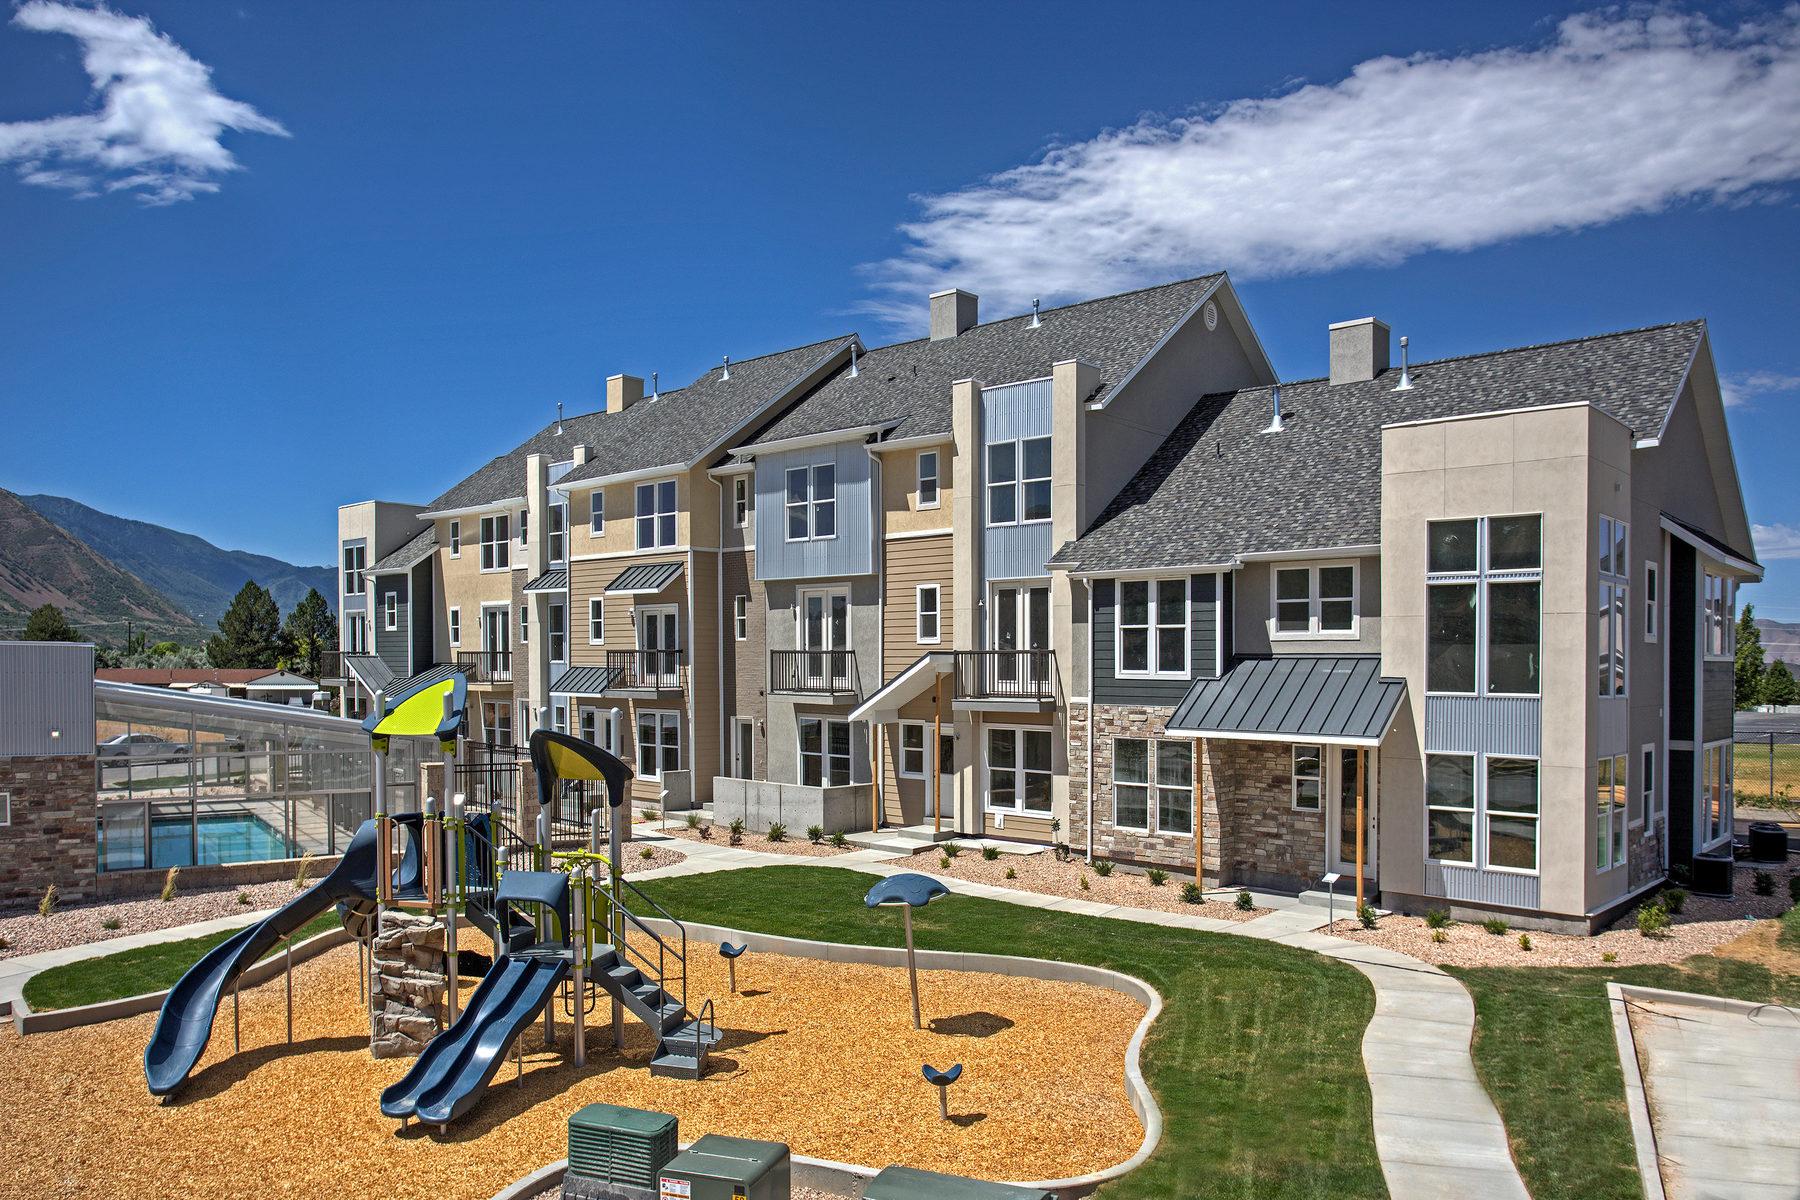 联栋屋 为 销售 在 The Soho Extended Design at The Ridge 1032 S High Ridge Rd Spanish Fork, 犹他州, 84660 美国